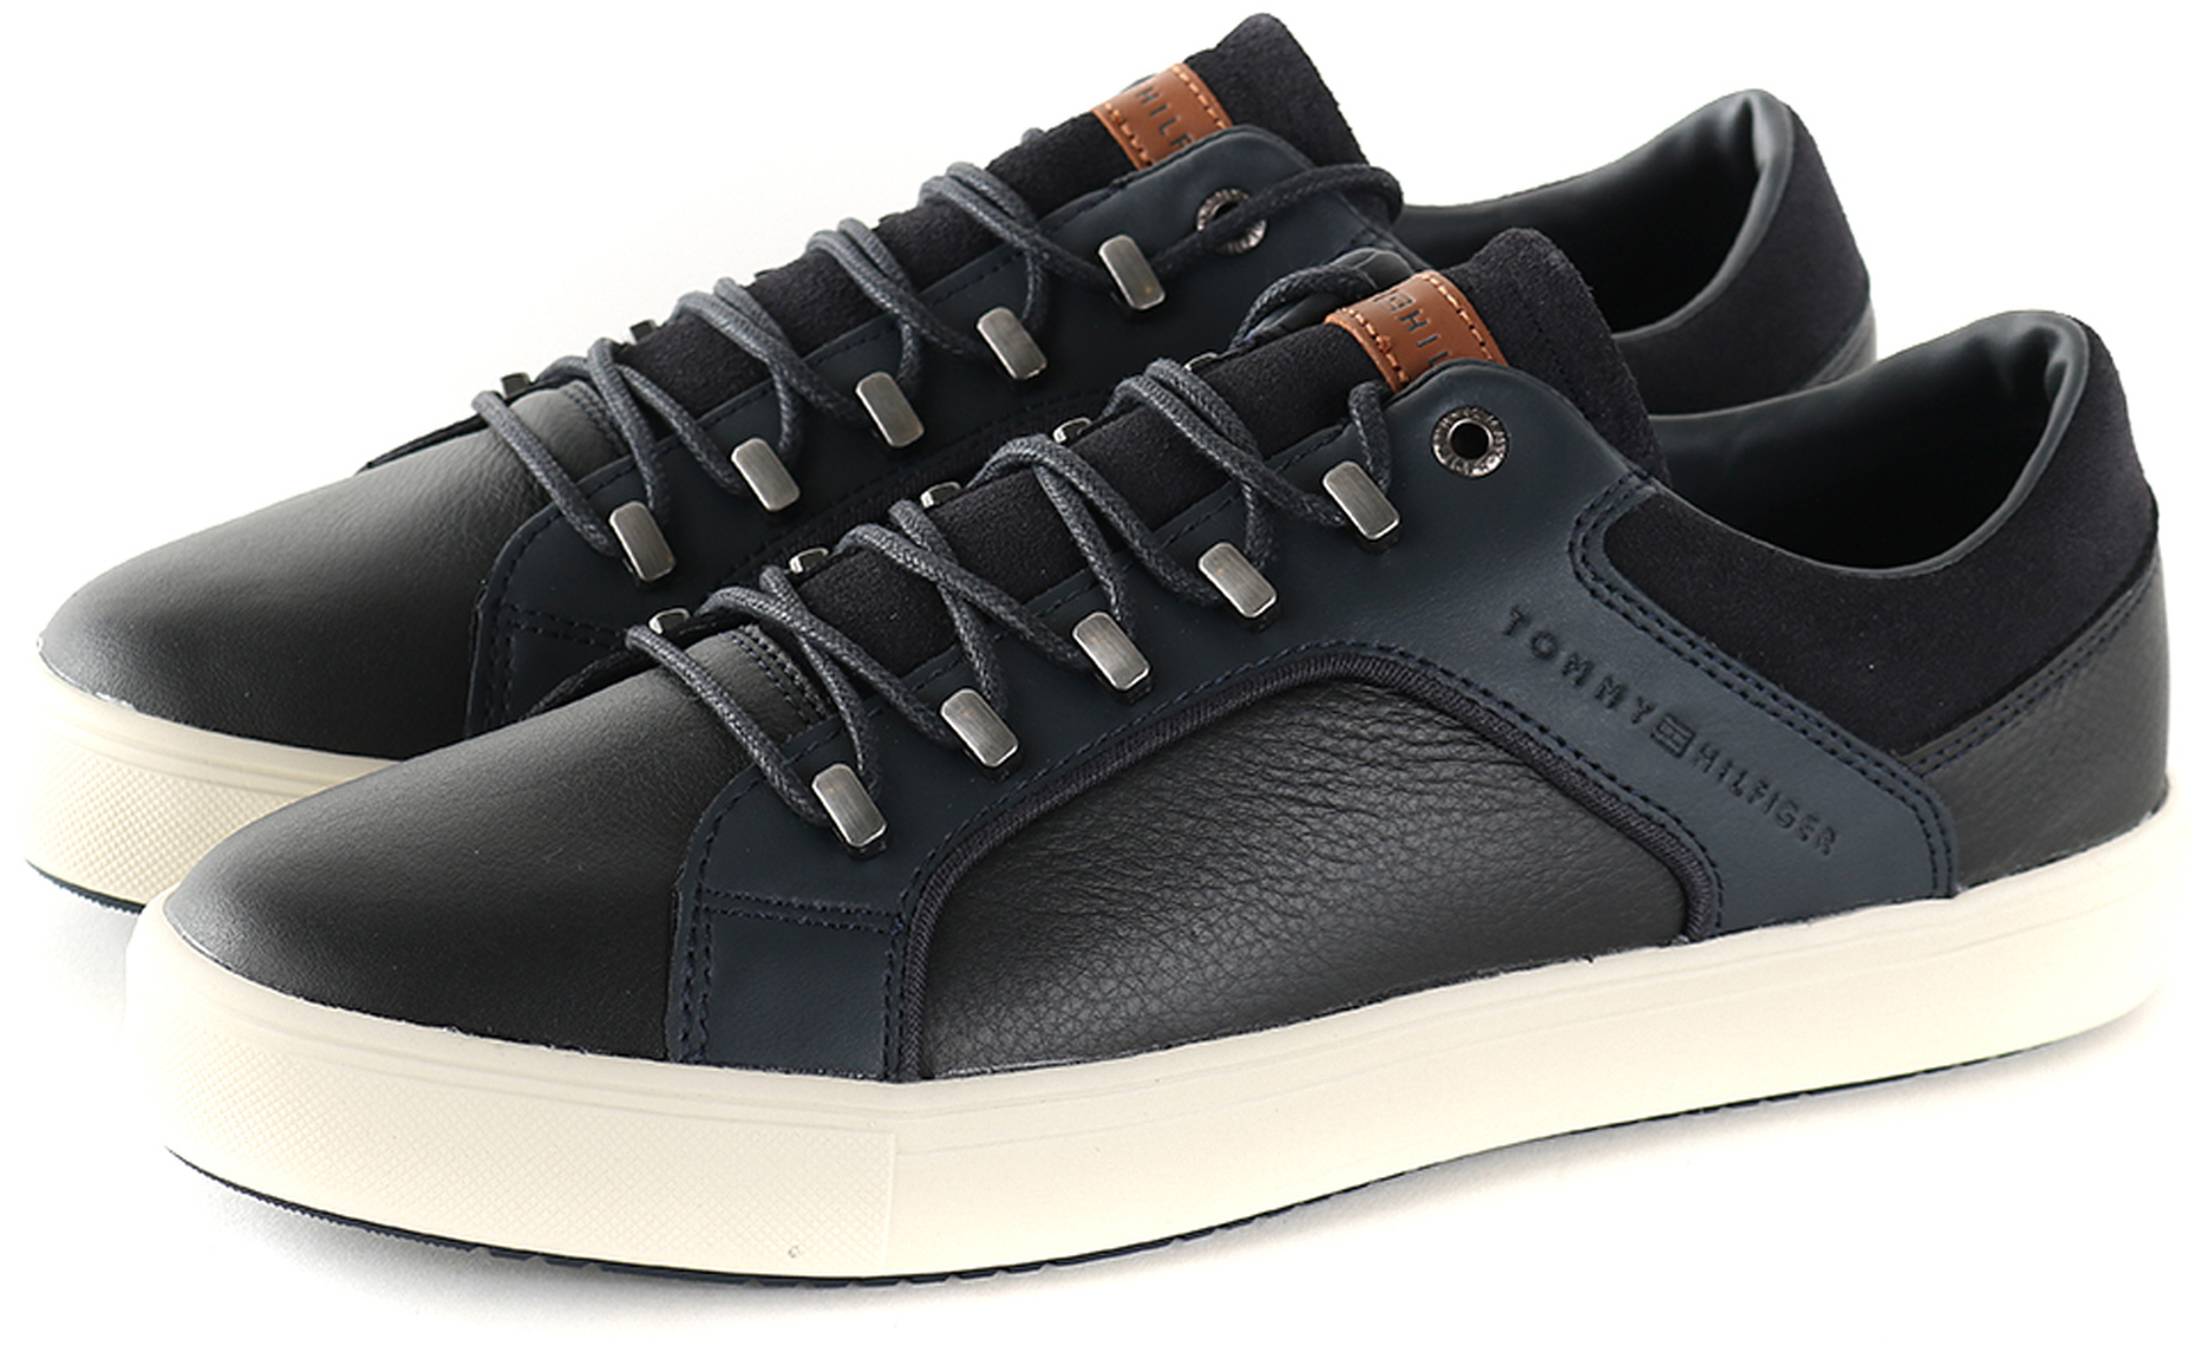 Tommy Hilfiger Sneaker Zwart + Donkerblauw foto 5